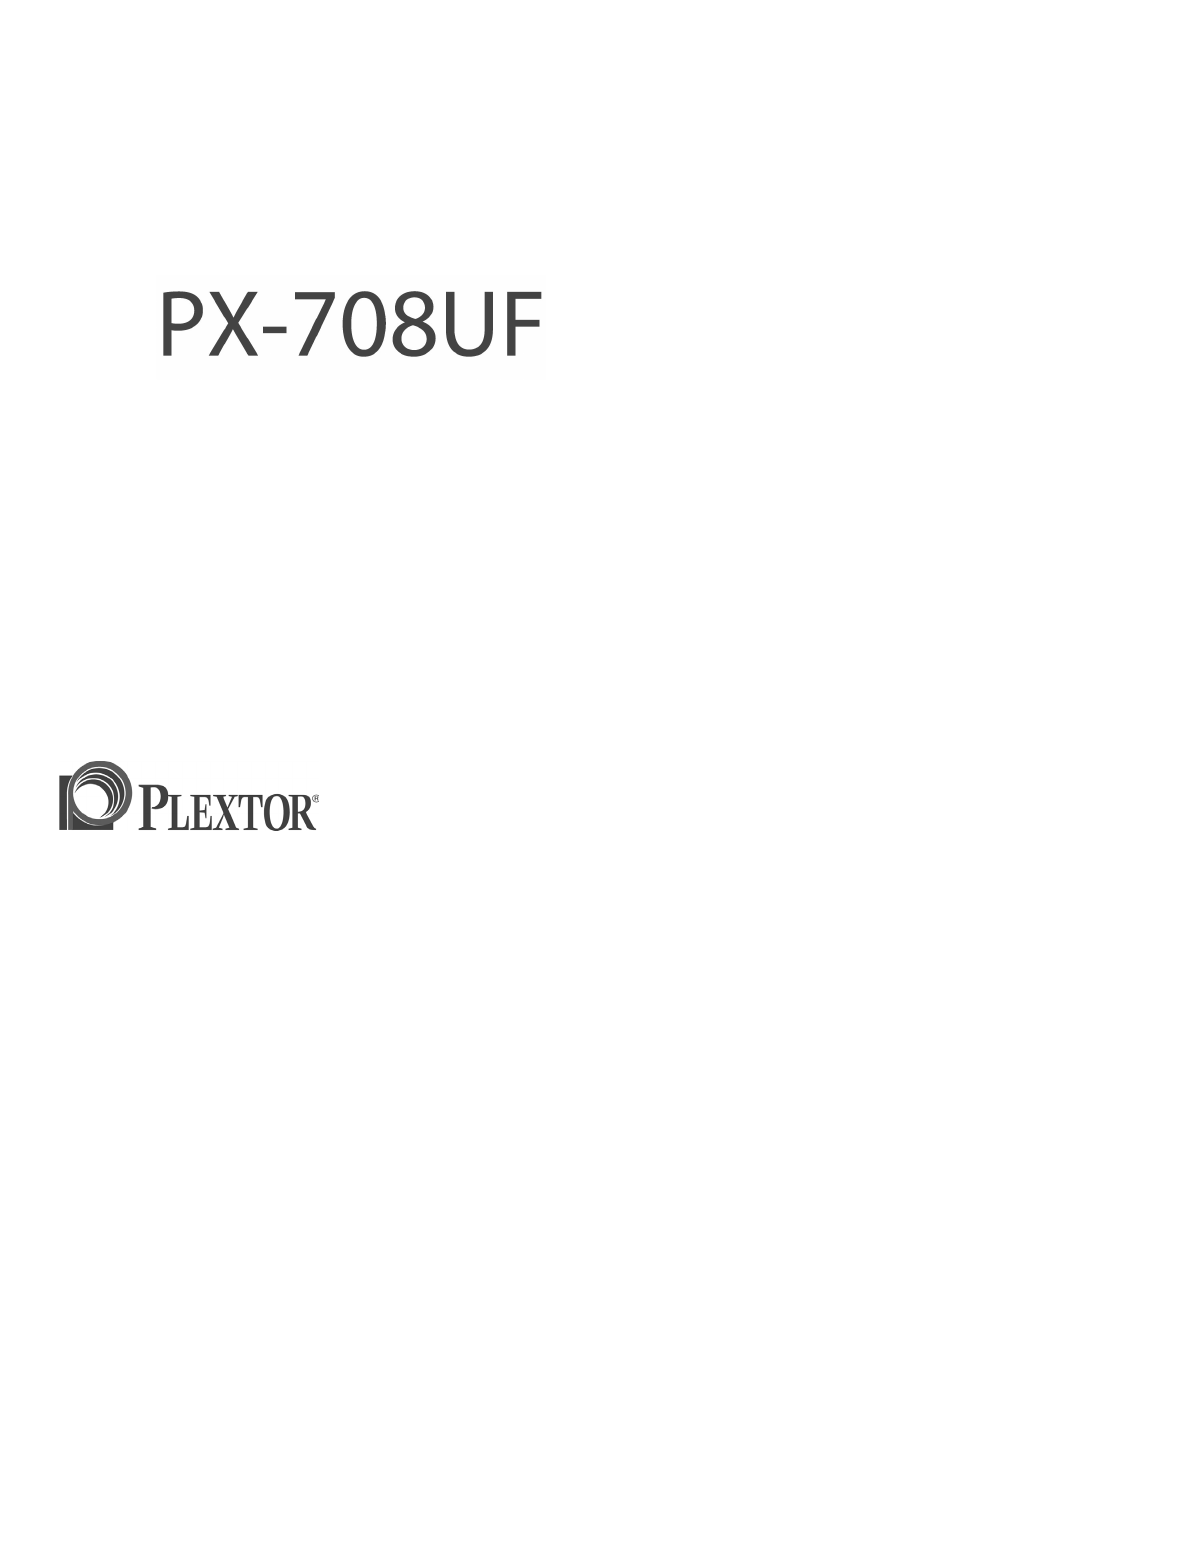 PLEXTOR PX-708UF2 DRIVER FOR MAC